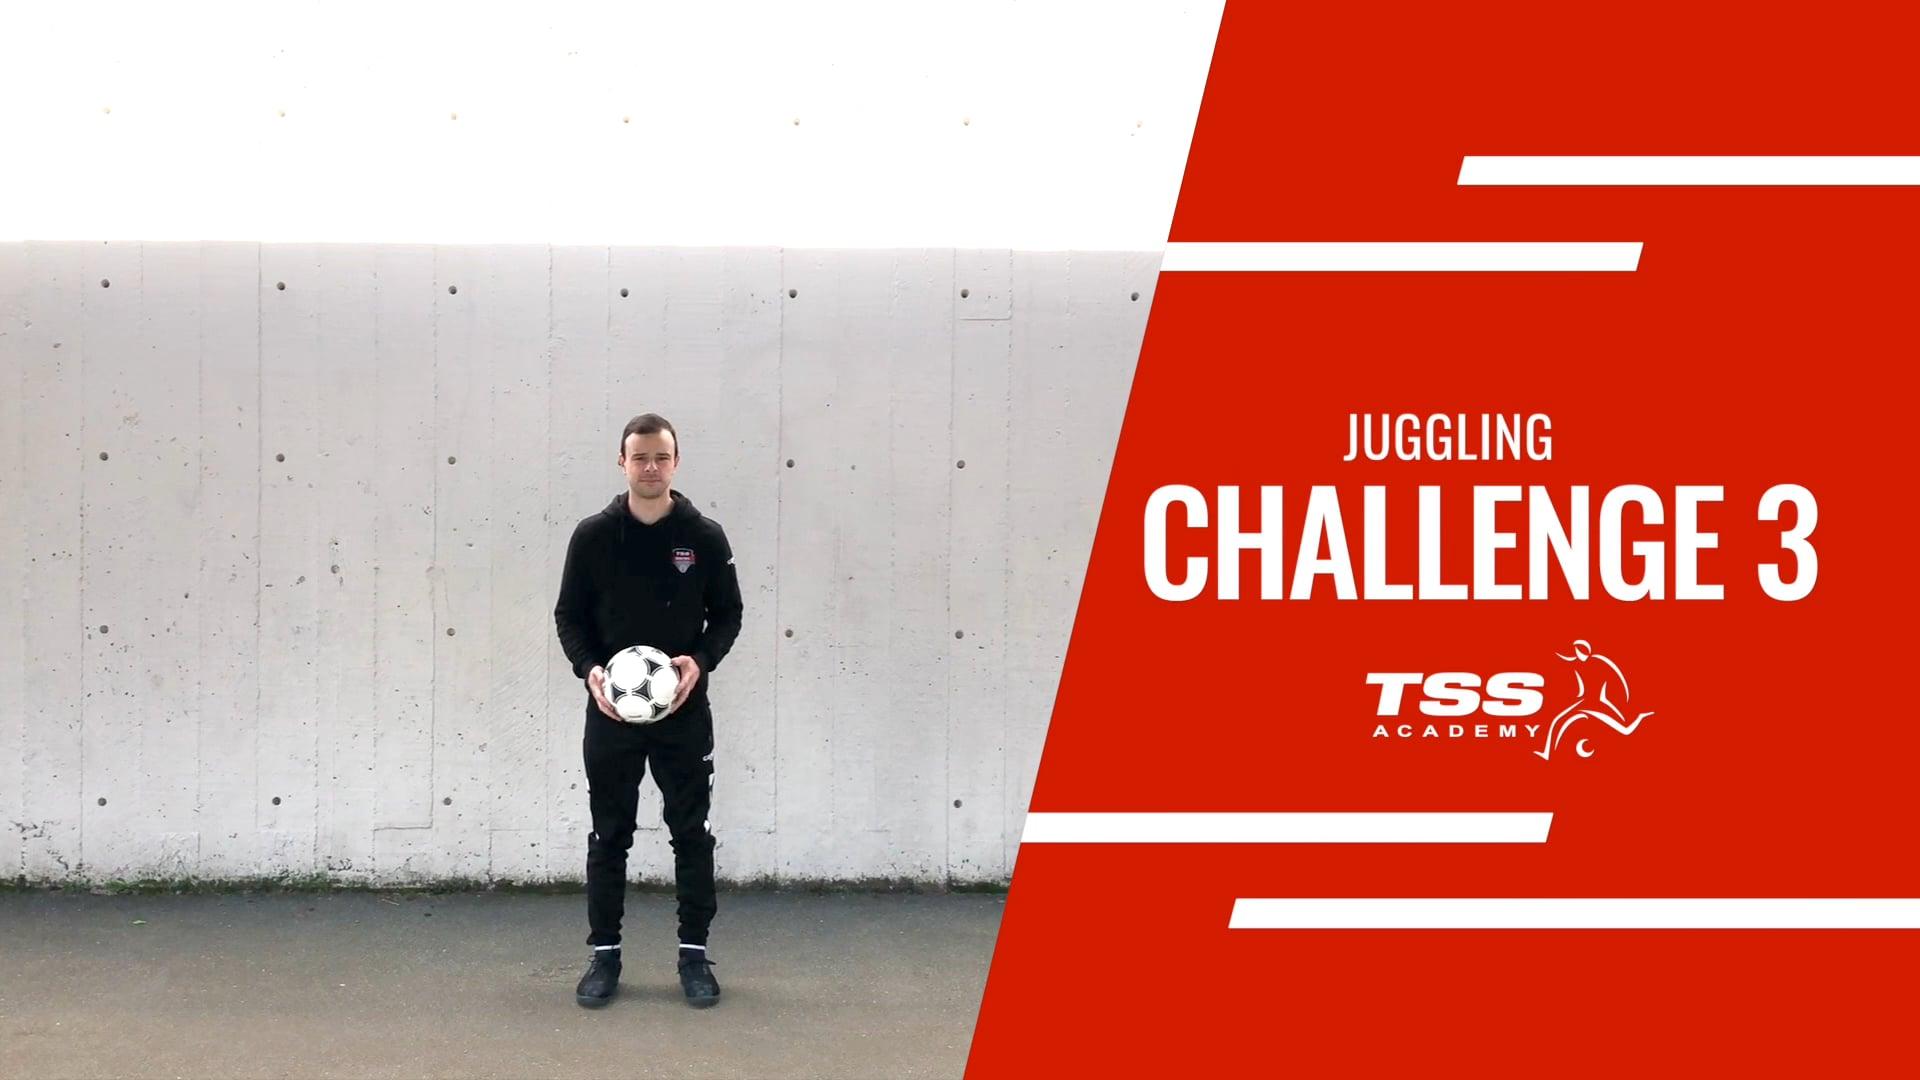 TSS Juggling Challenge 3